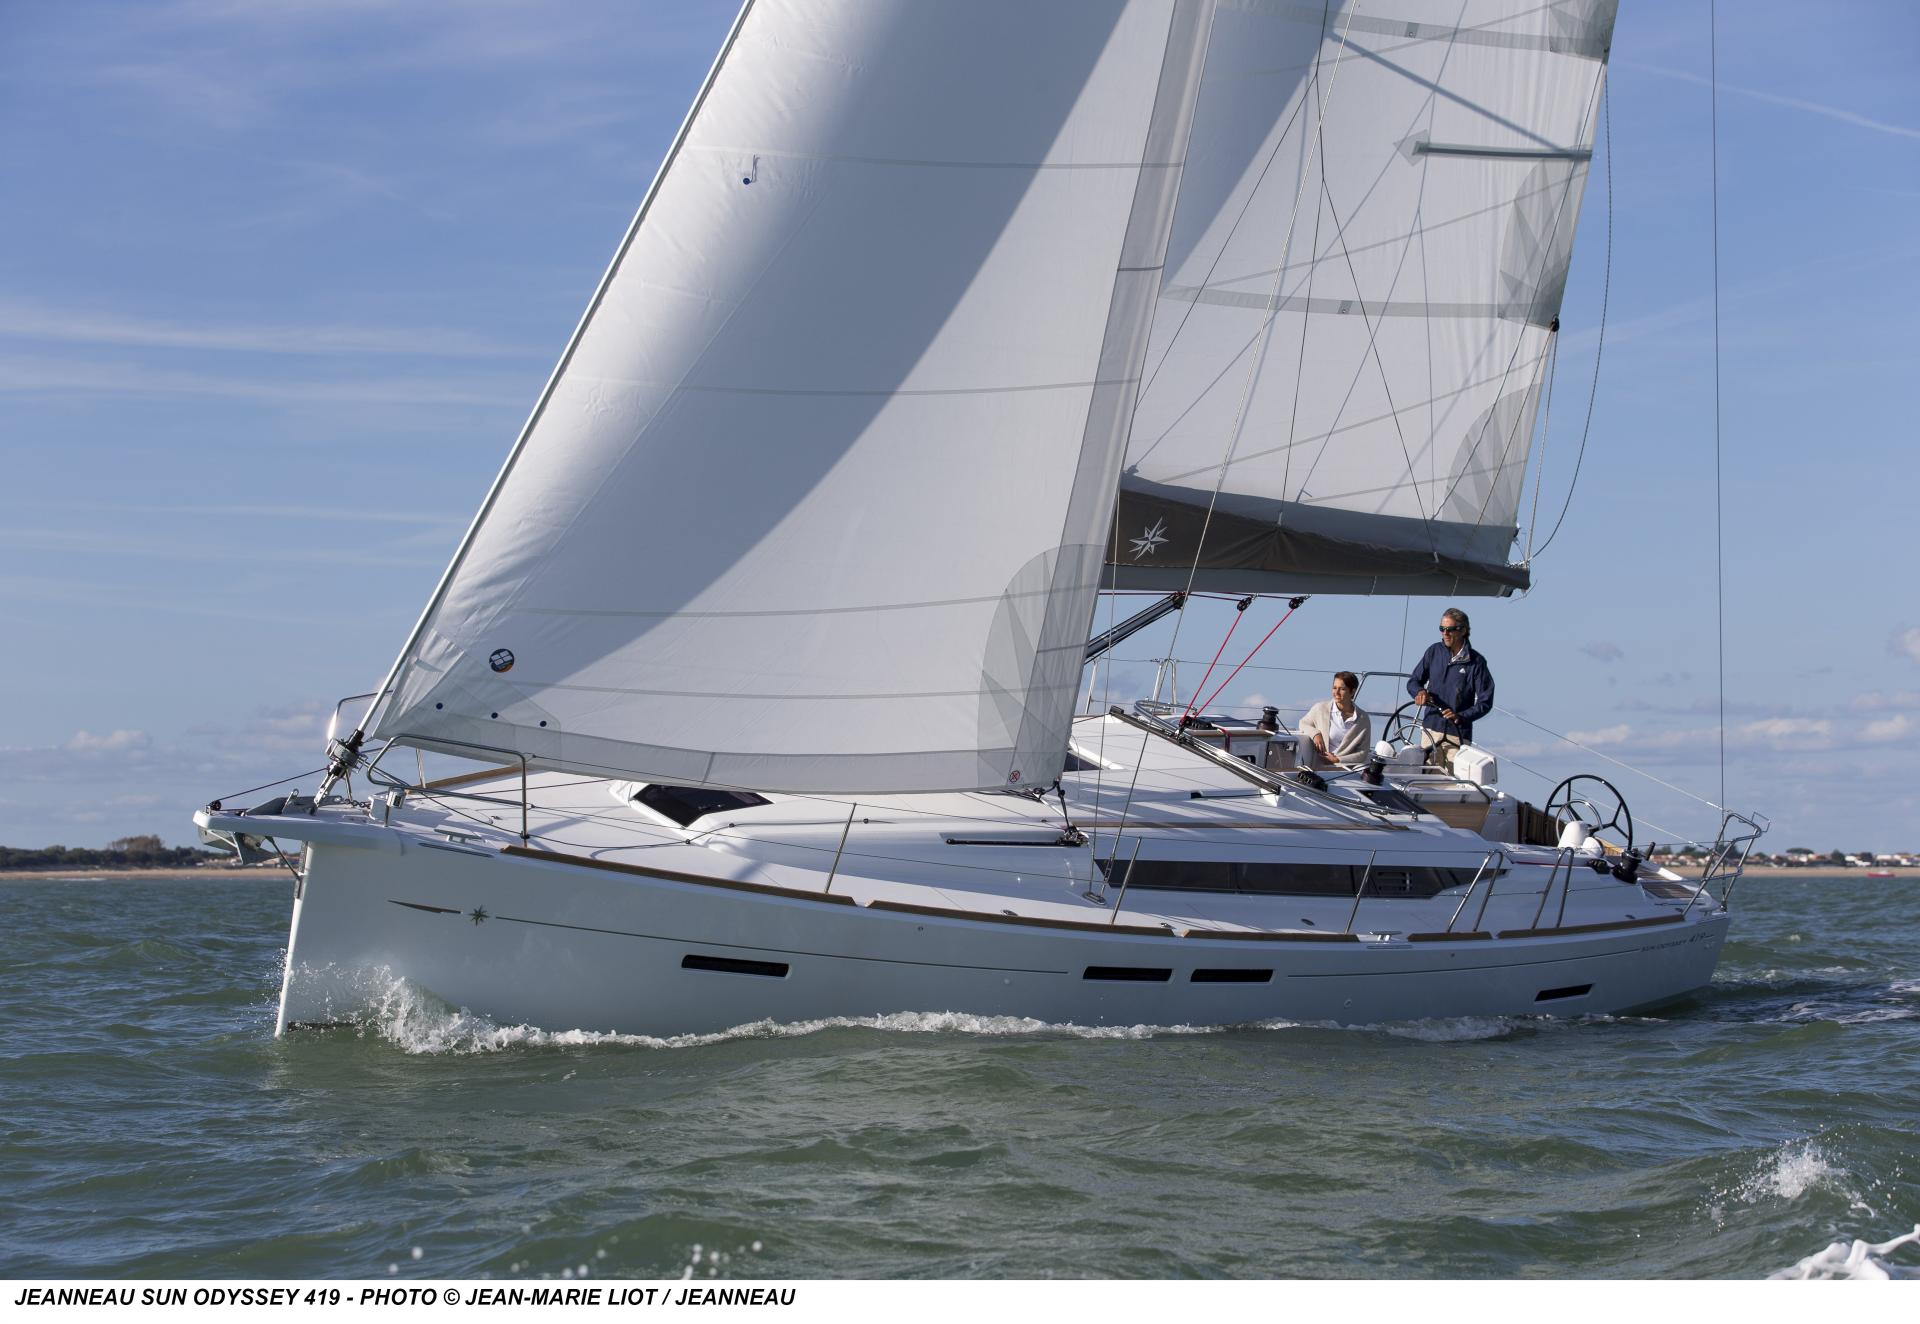 Jeanneau Sun Odyssey 419 - Zephyrus